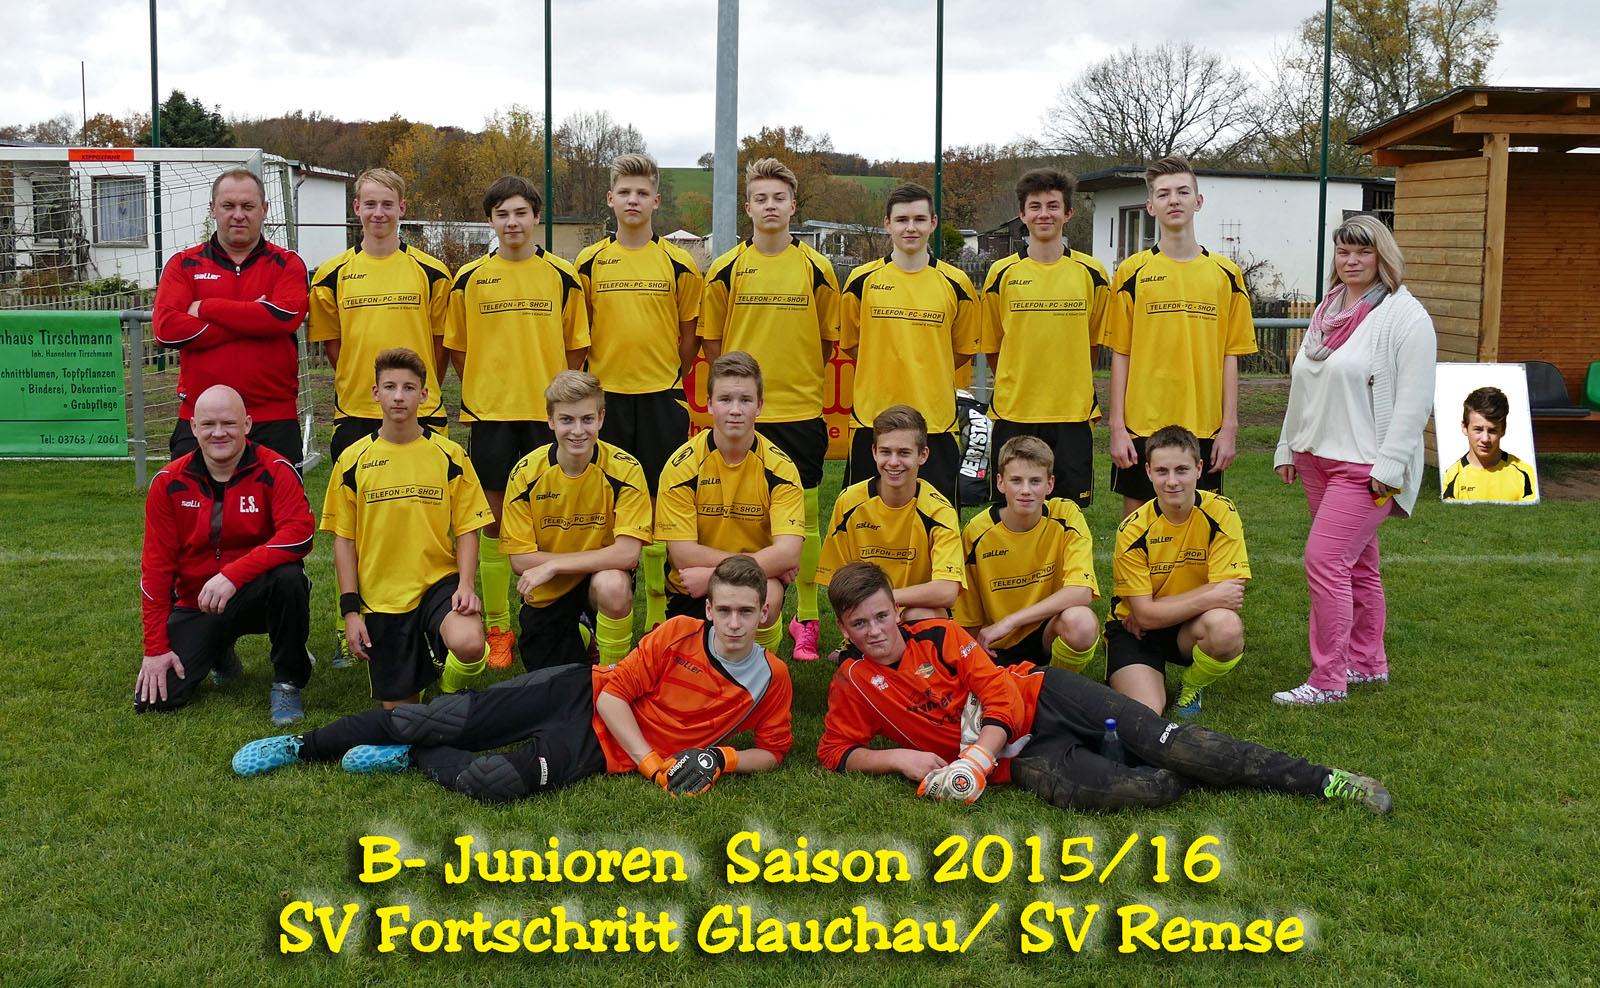 B- Junioren 2015/16